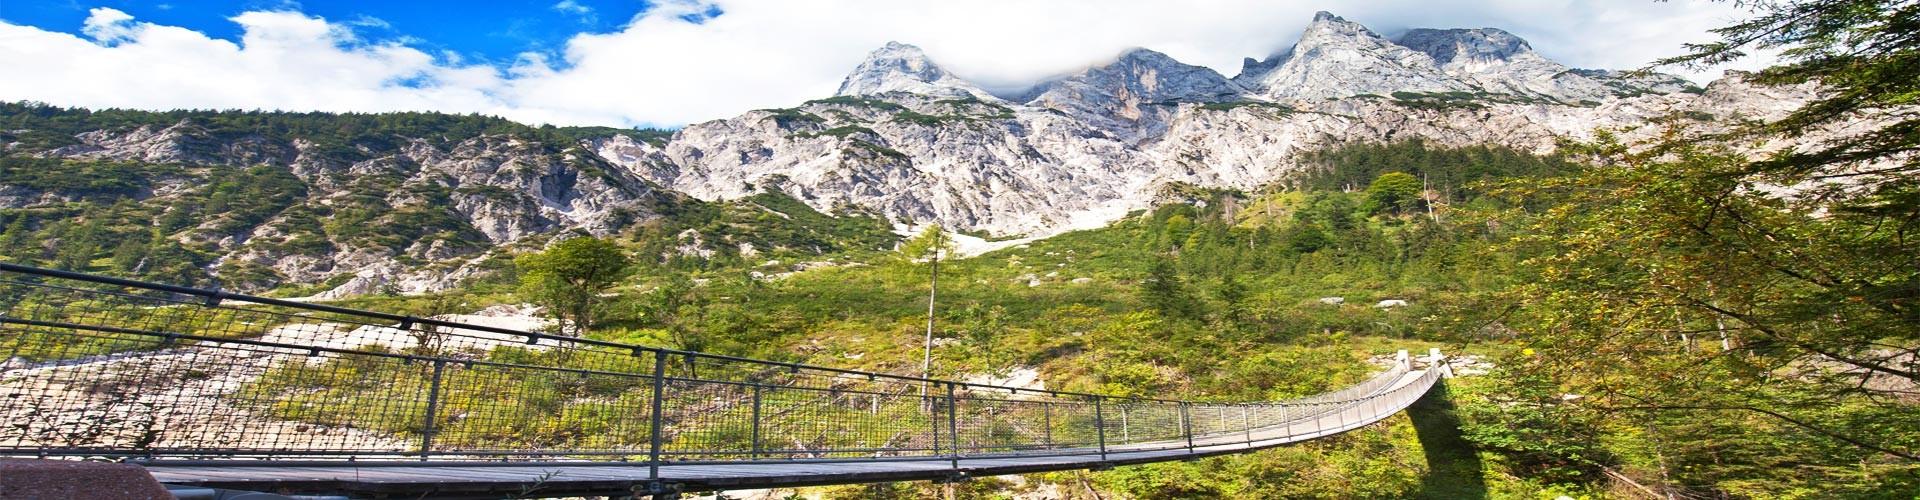 Hängebrücke im Nationalpark Berchtesgaden